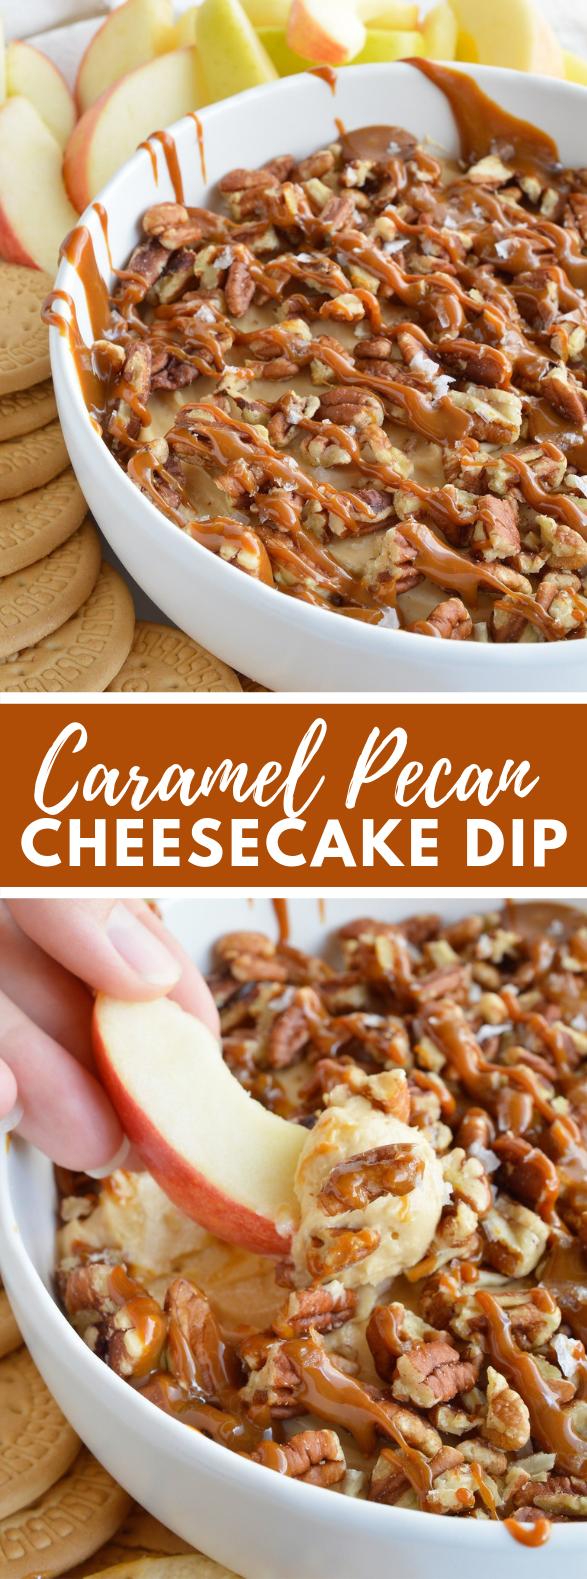 Salted Caramel Pecan Cheesecake Dip #desserts #5minutes